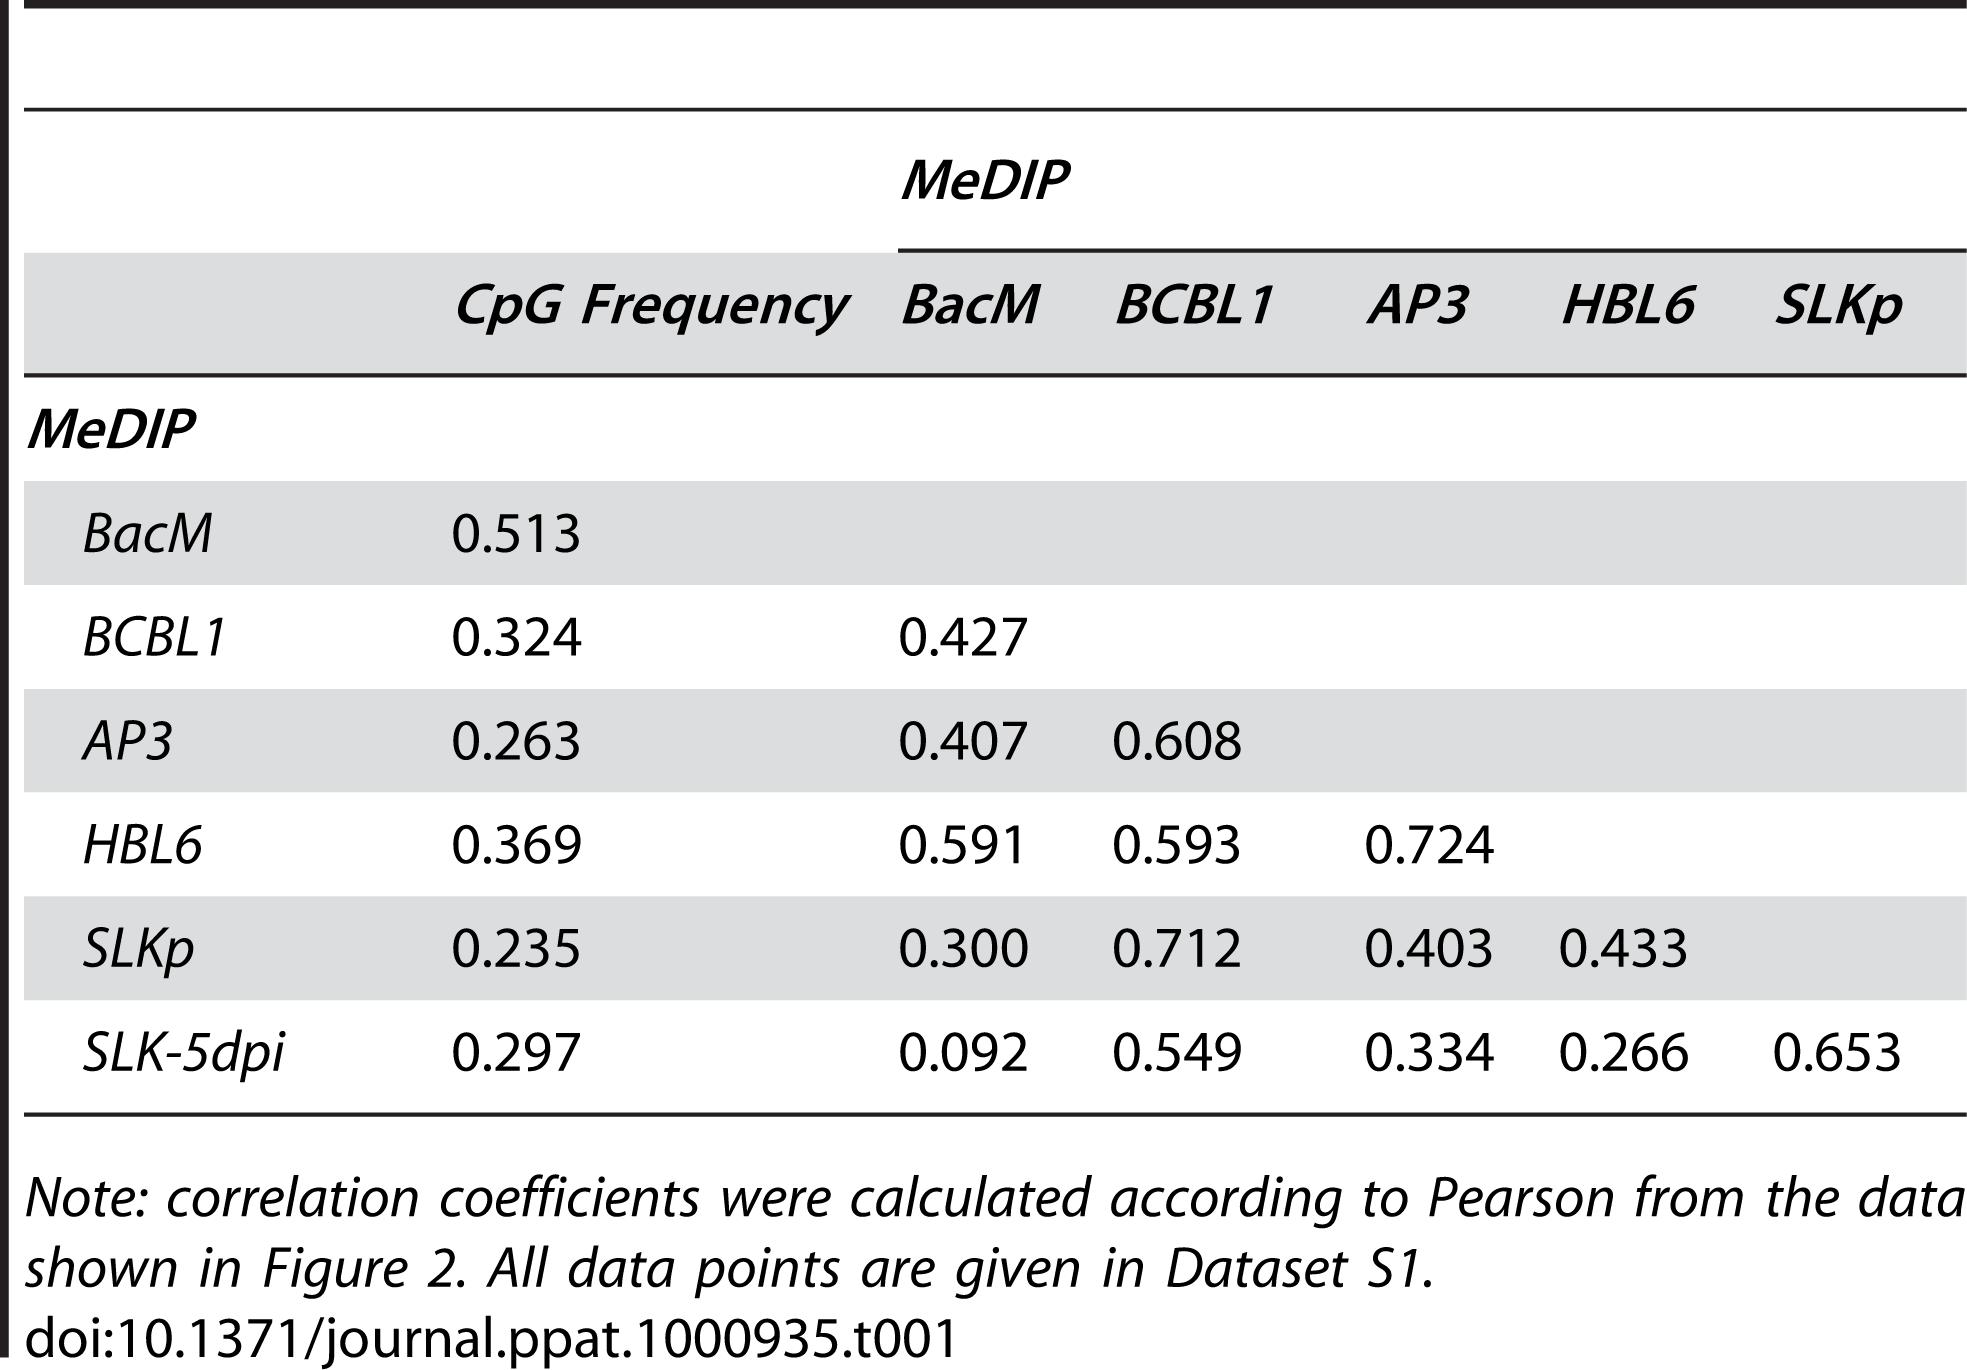 Pearson correlation coefficients of DNA methylation patterns.